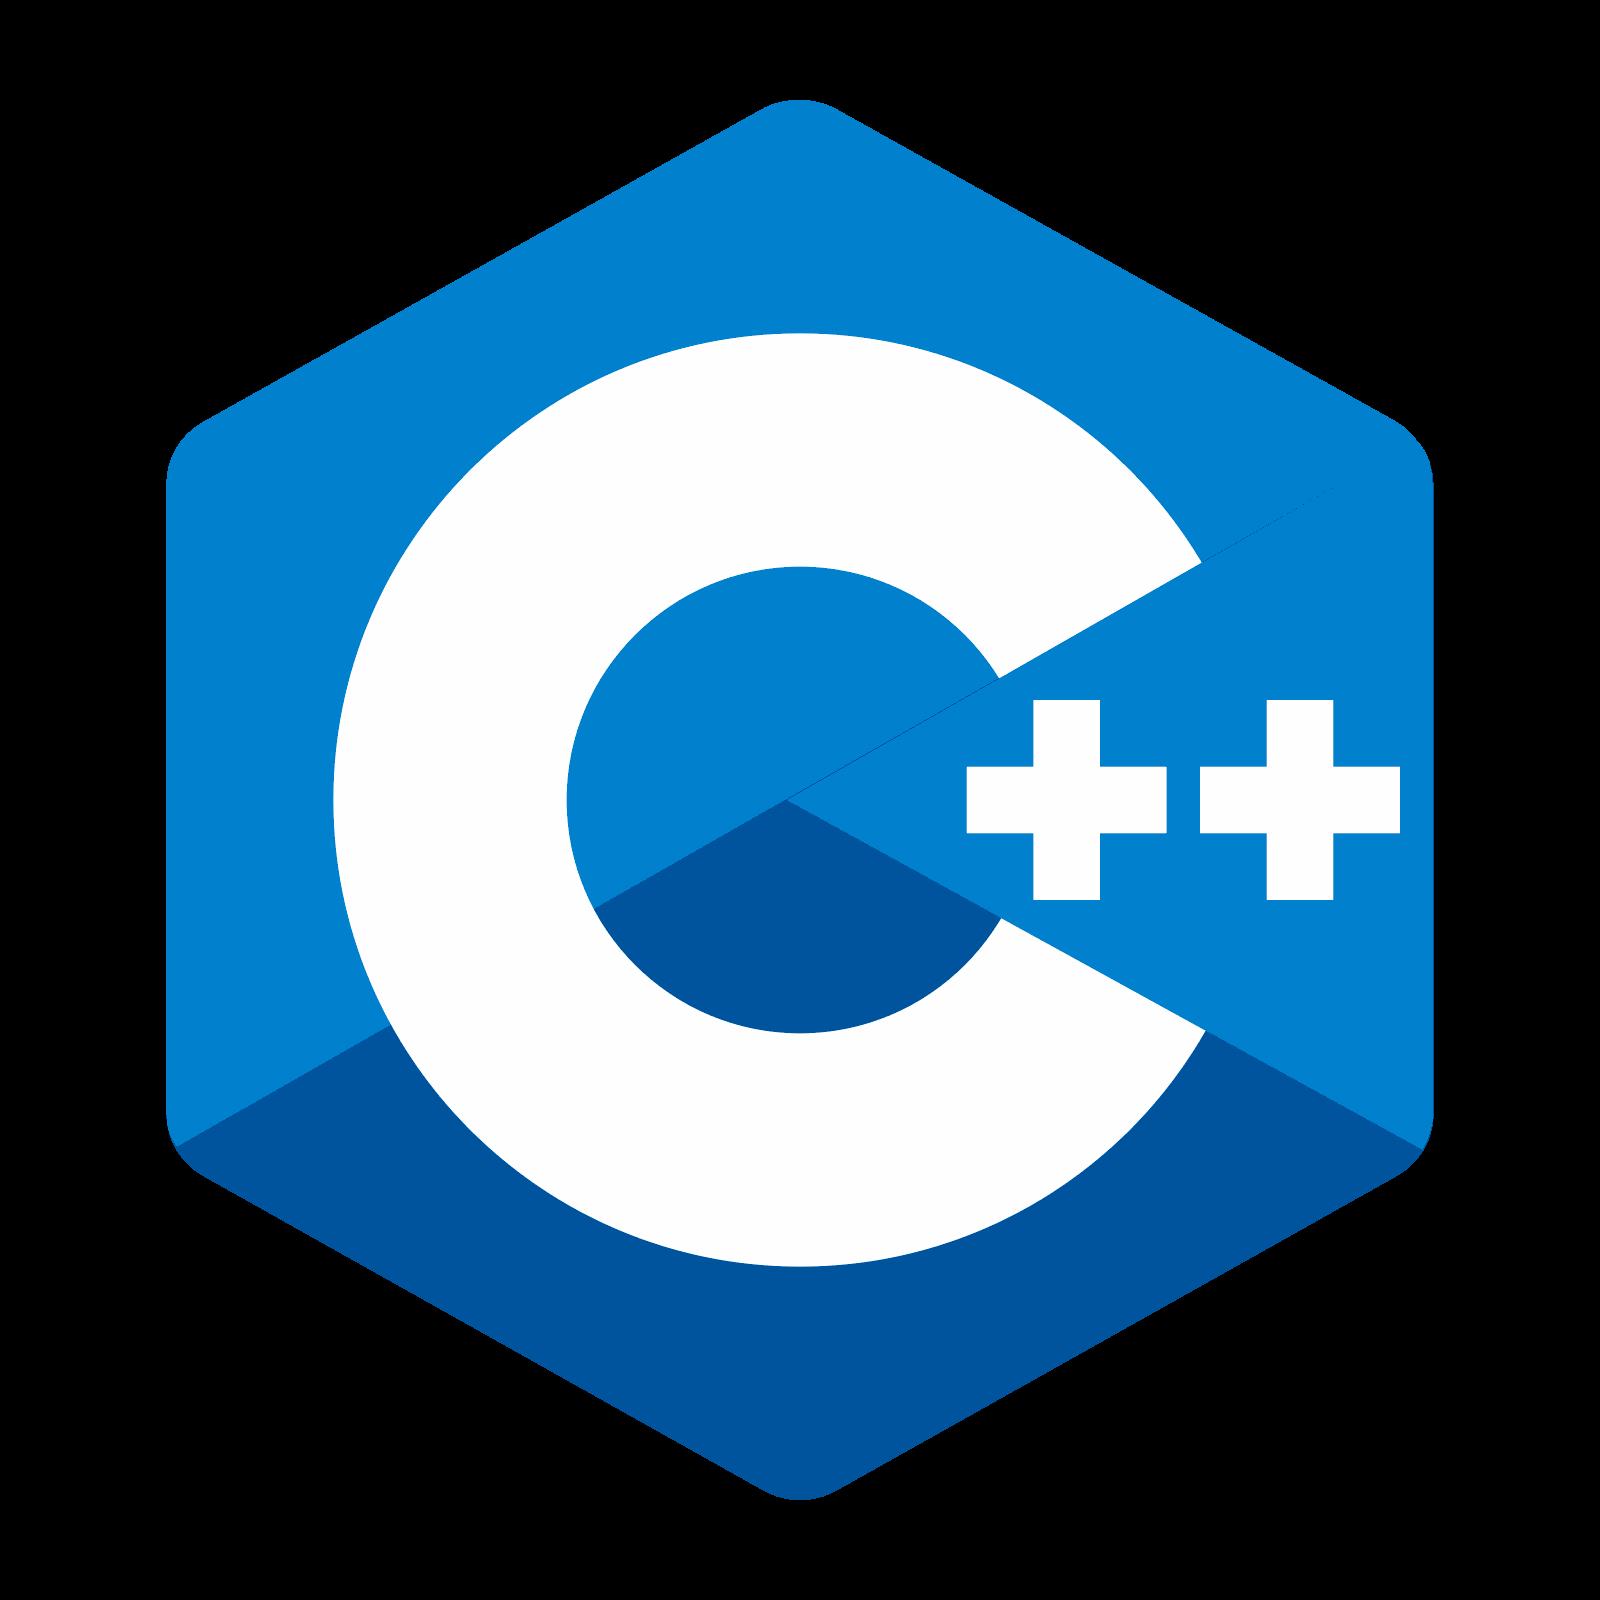 turbo c program download for windows webforpc